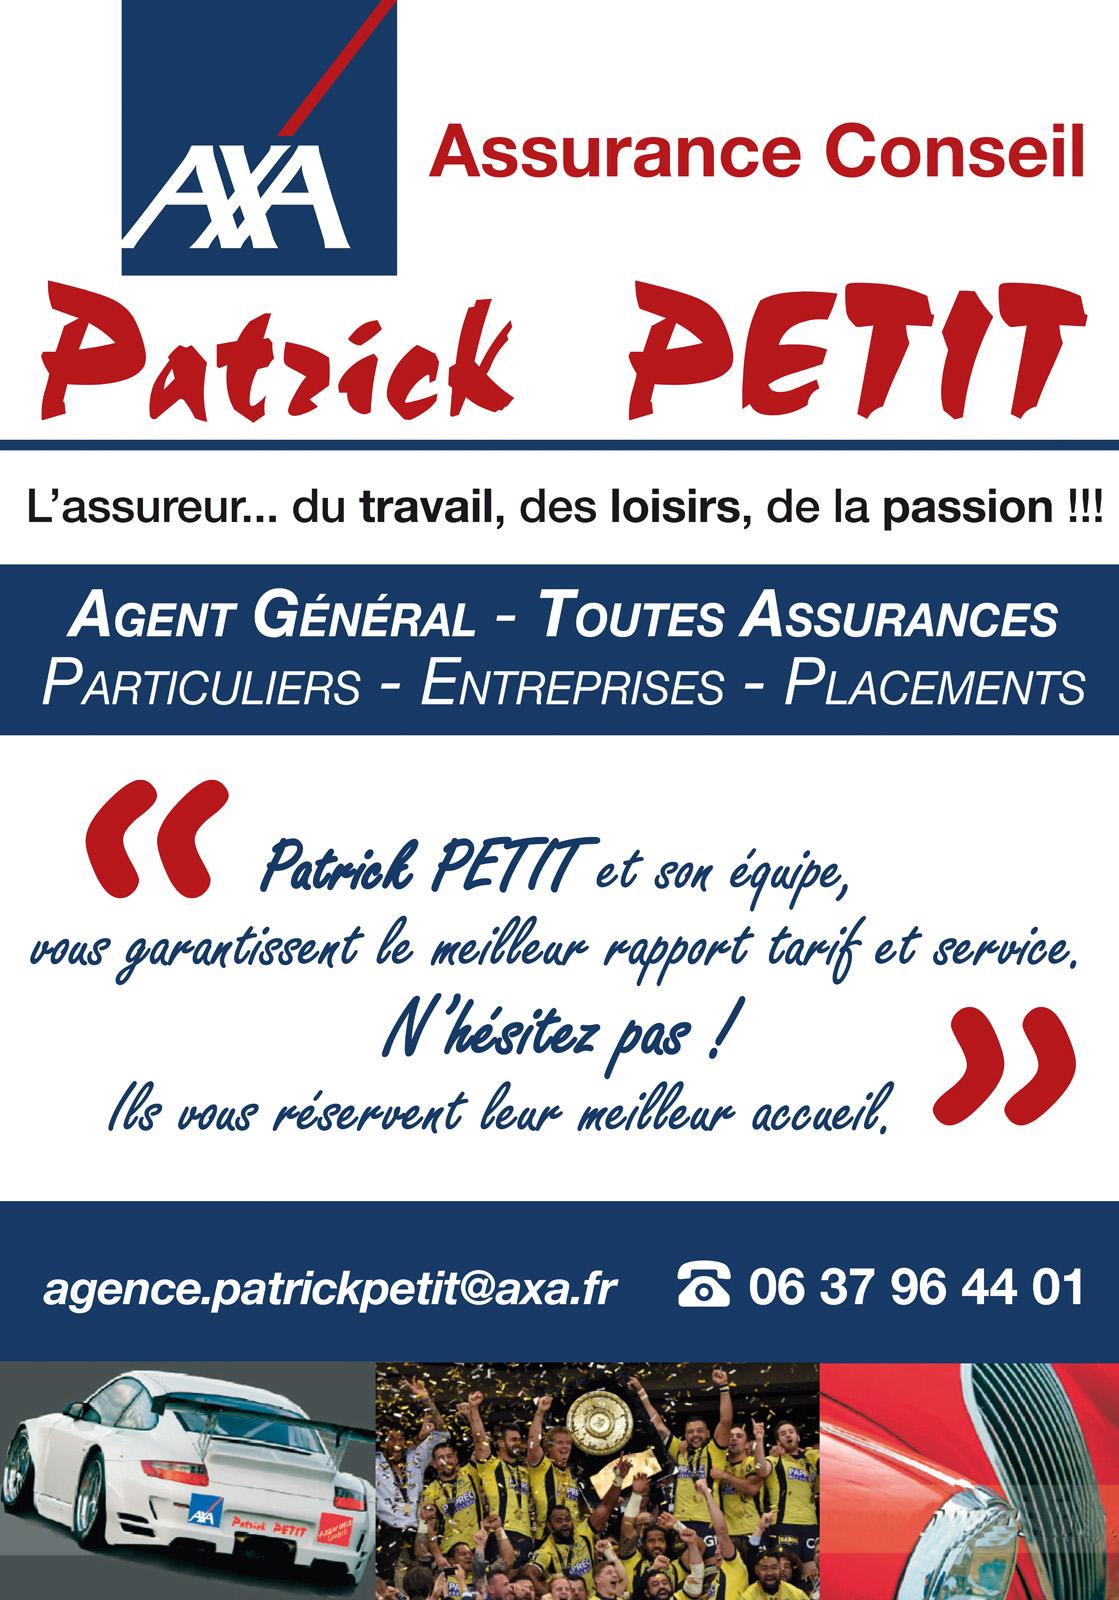 logo AXA Assurances - Agence Patrick Petit